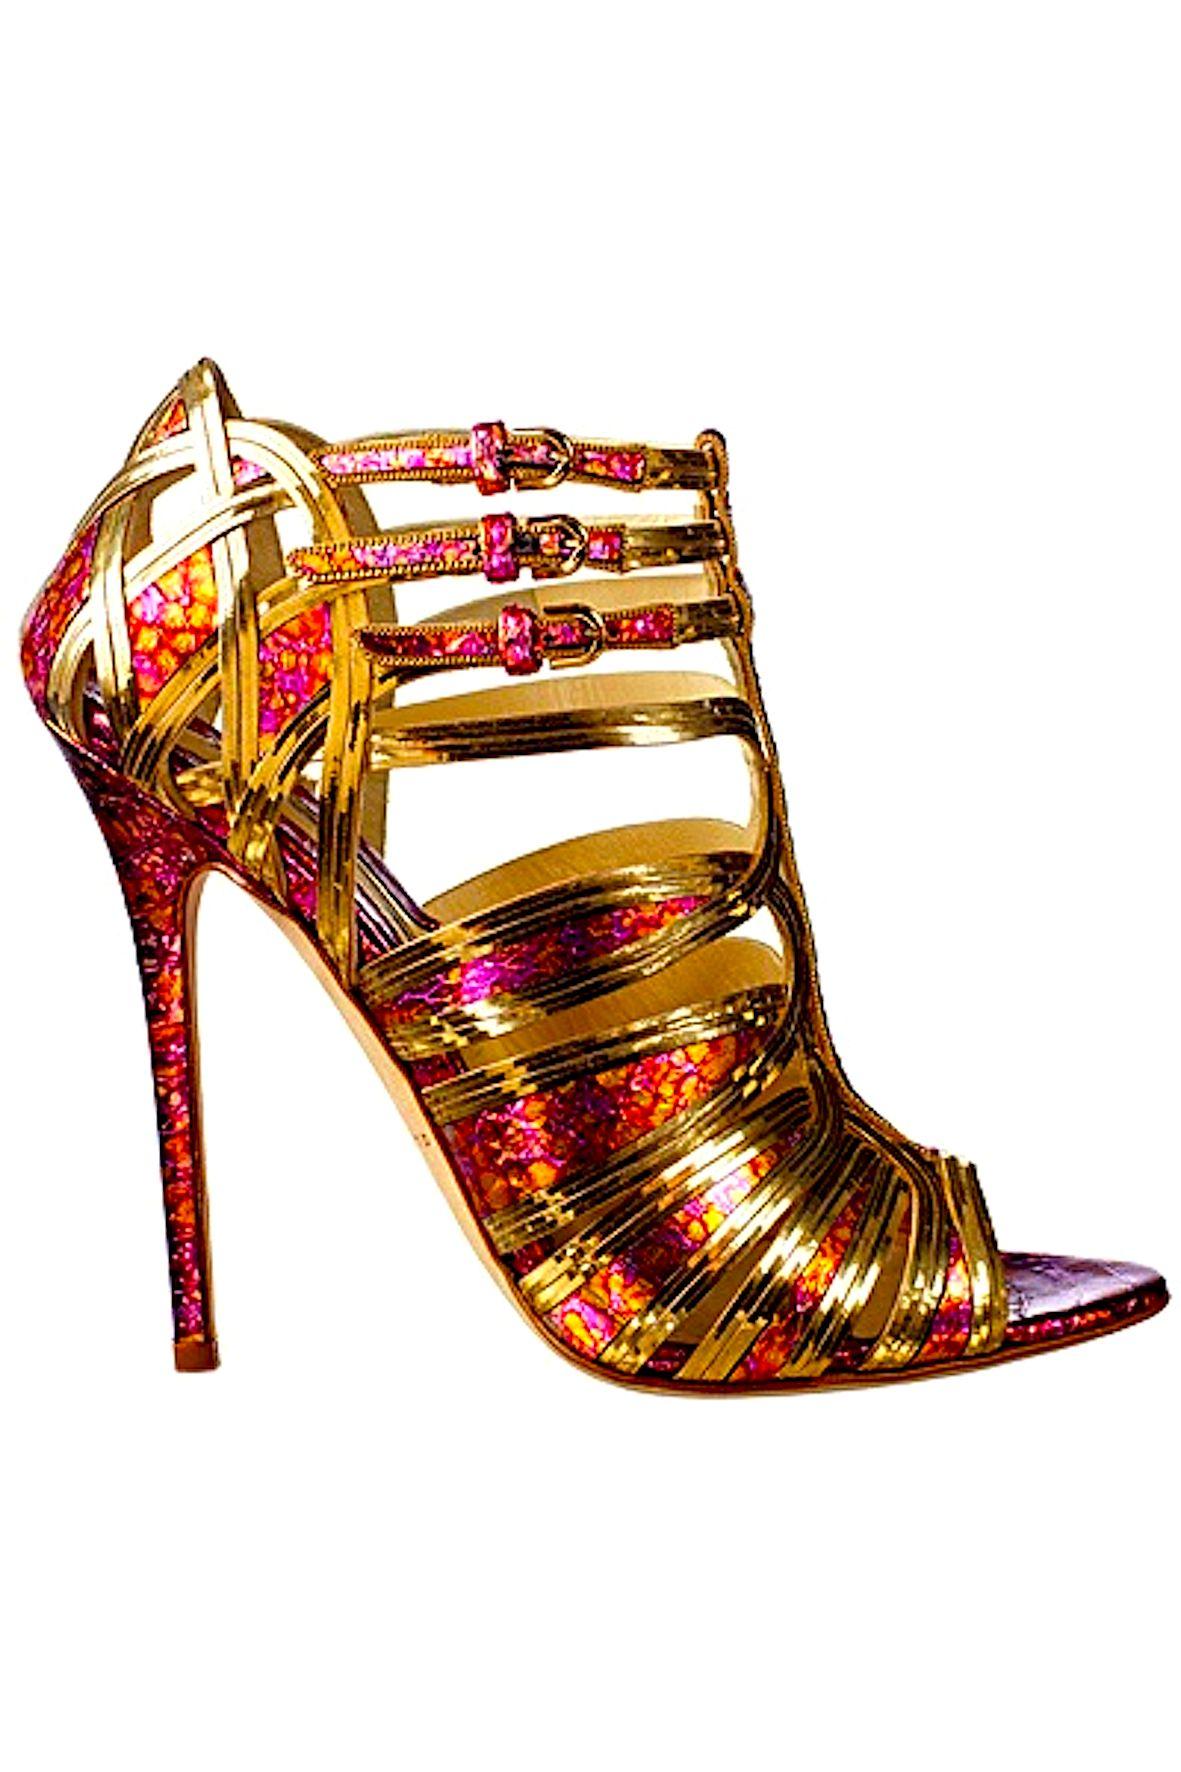 Brian Atwood  Heel Joy  Pinterest  Metallic gold Metallic and